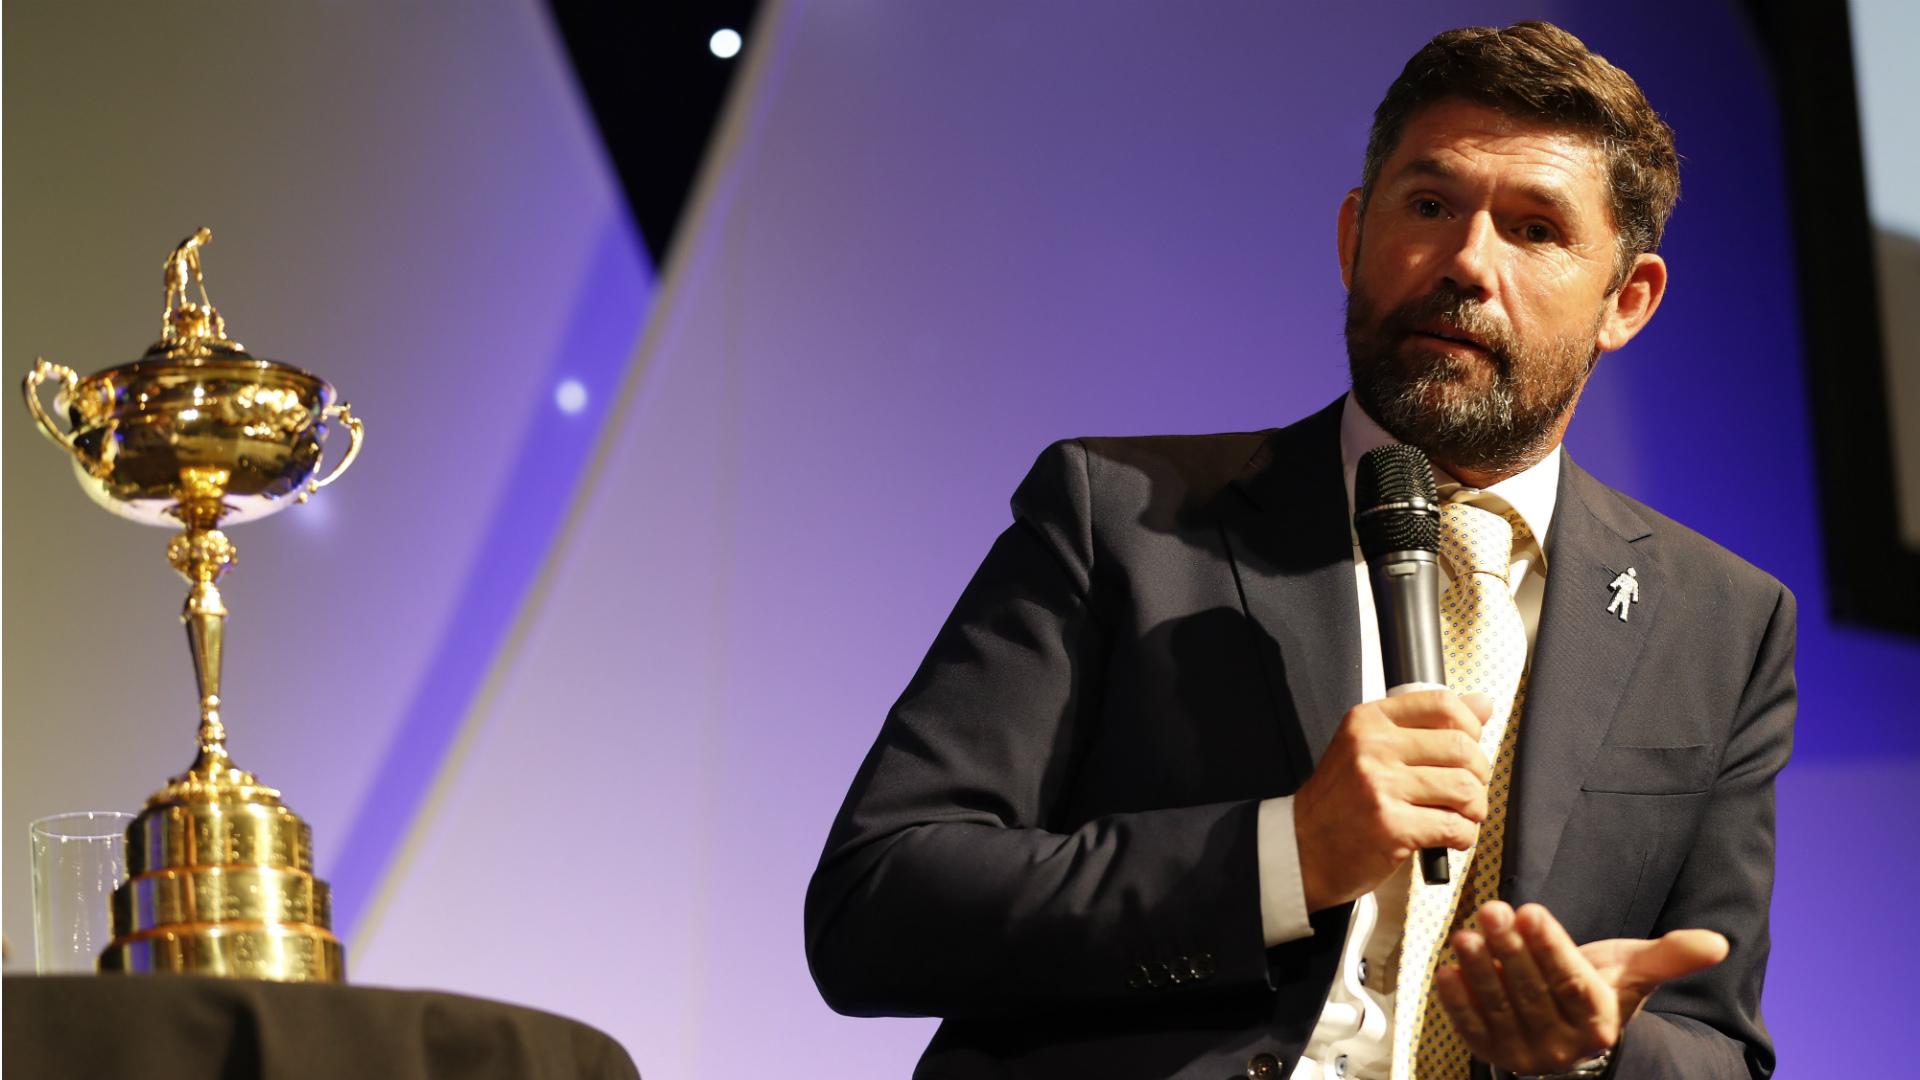 Coronavirus: Some European Tour players will be struggling financially, says Harrington